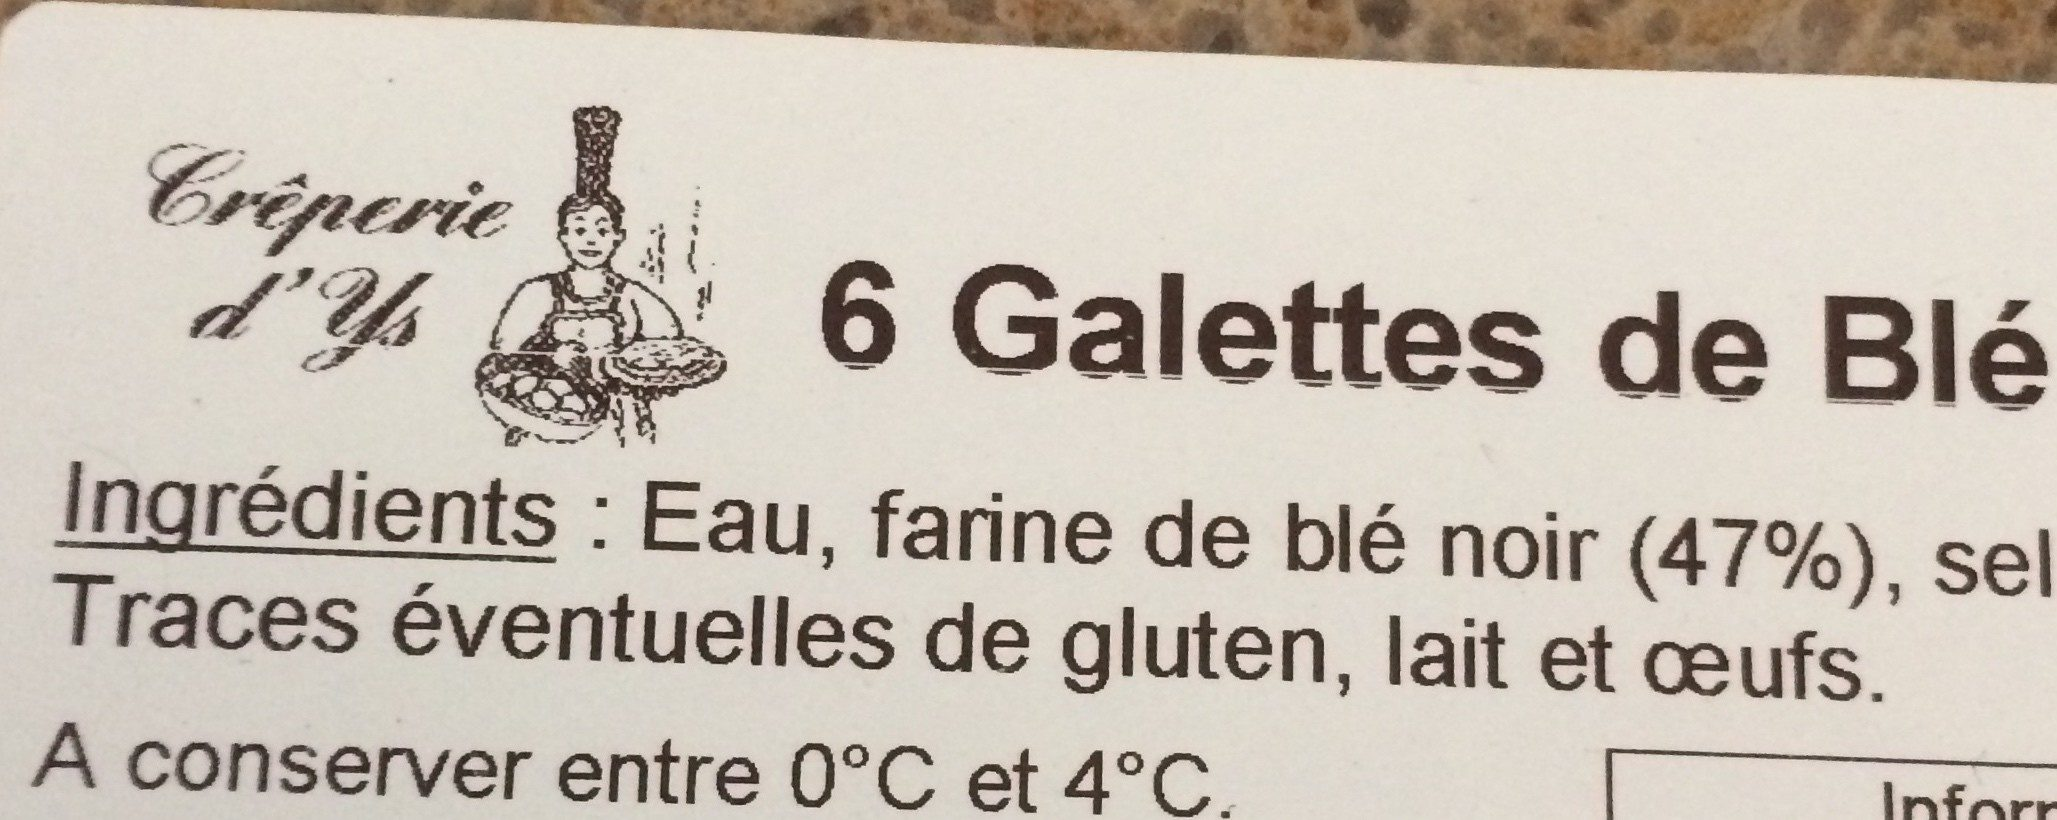 Galettes blé noir - Ingrediënten